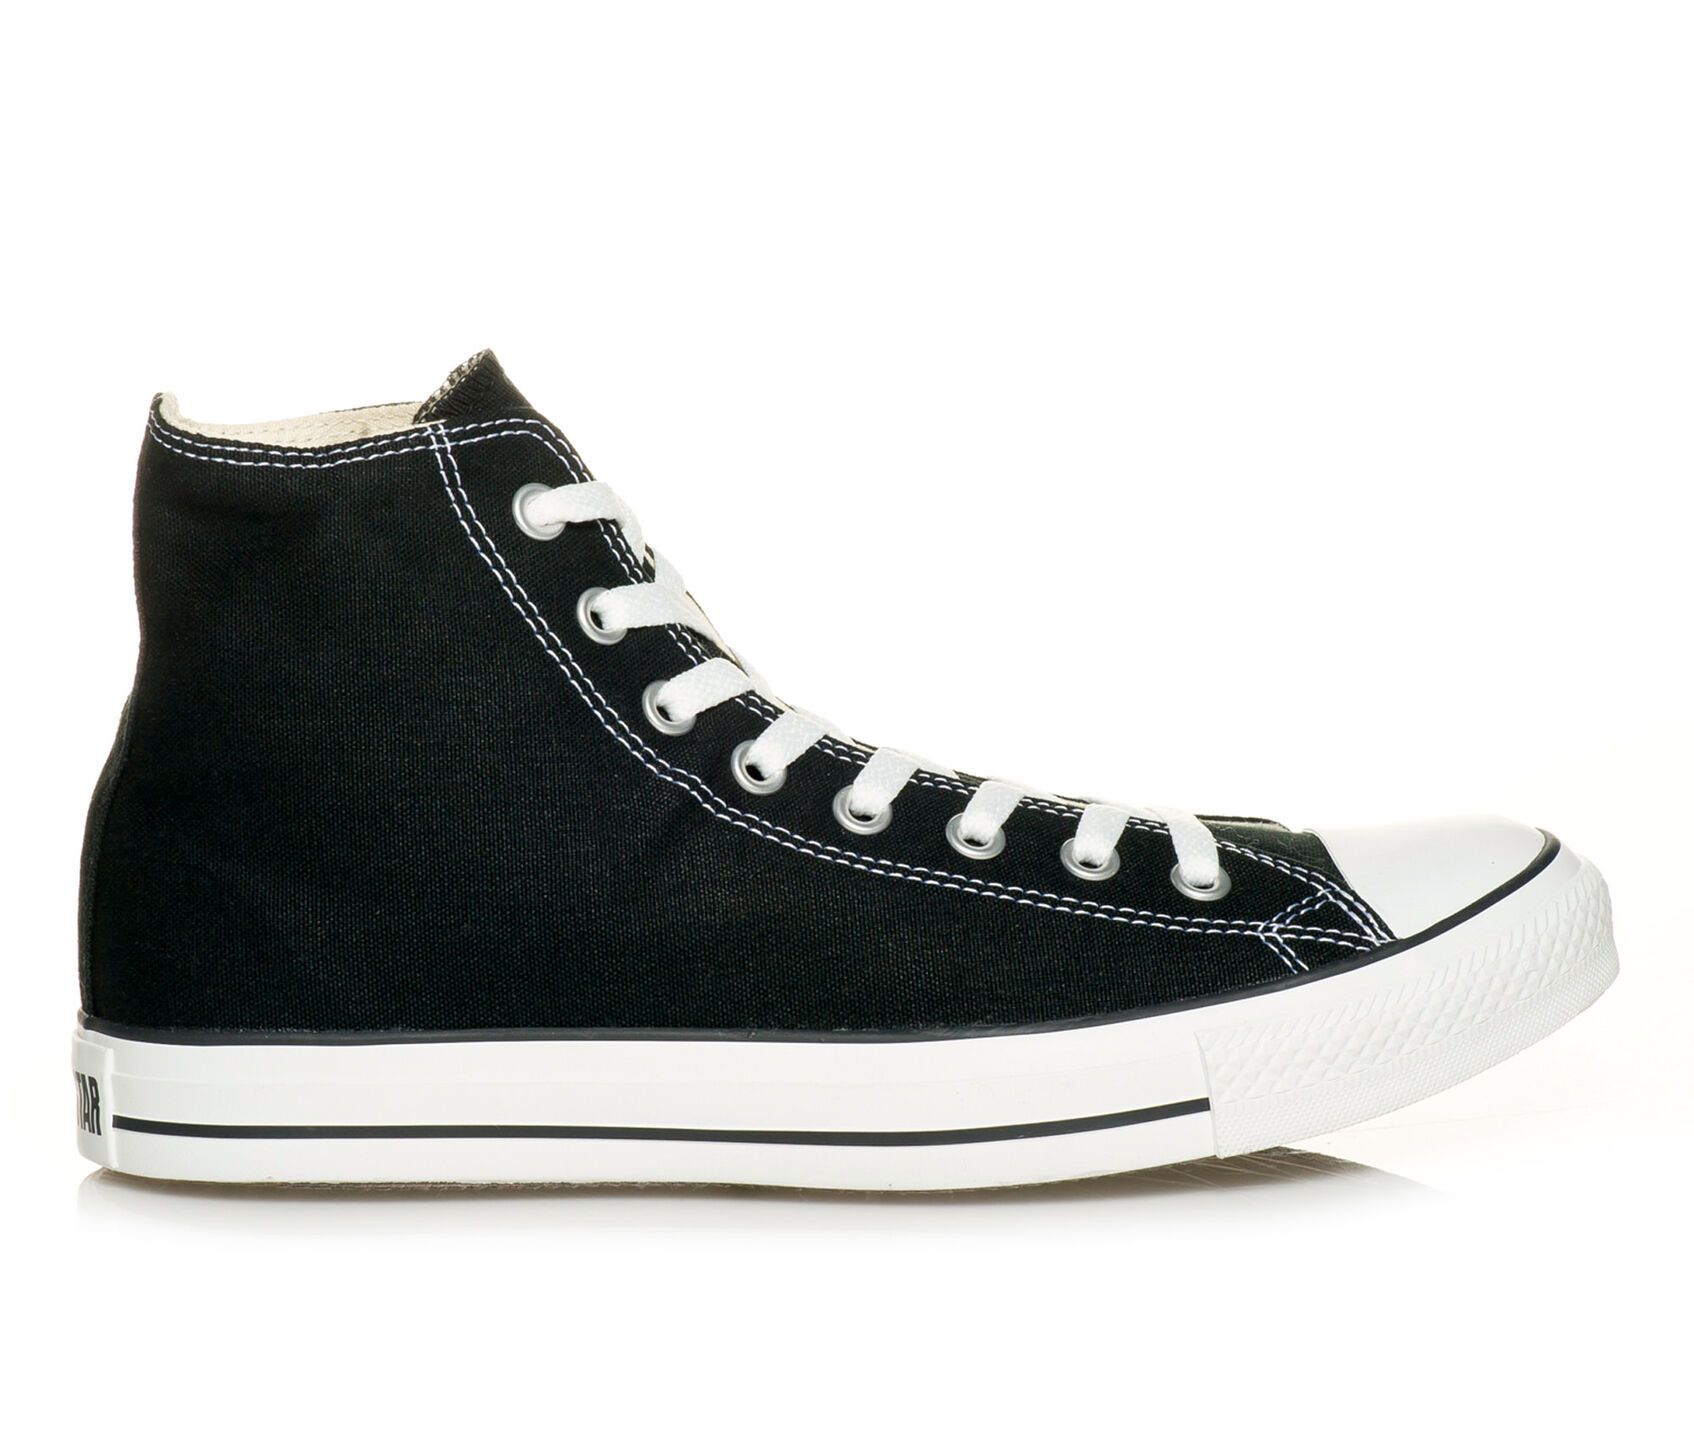 All Black Converse Shoe Carnival